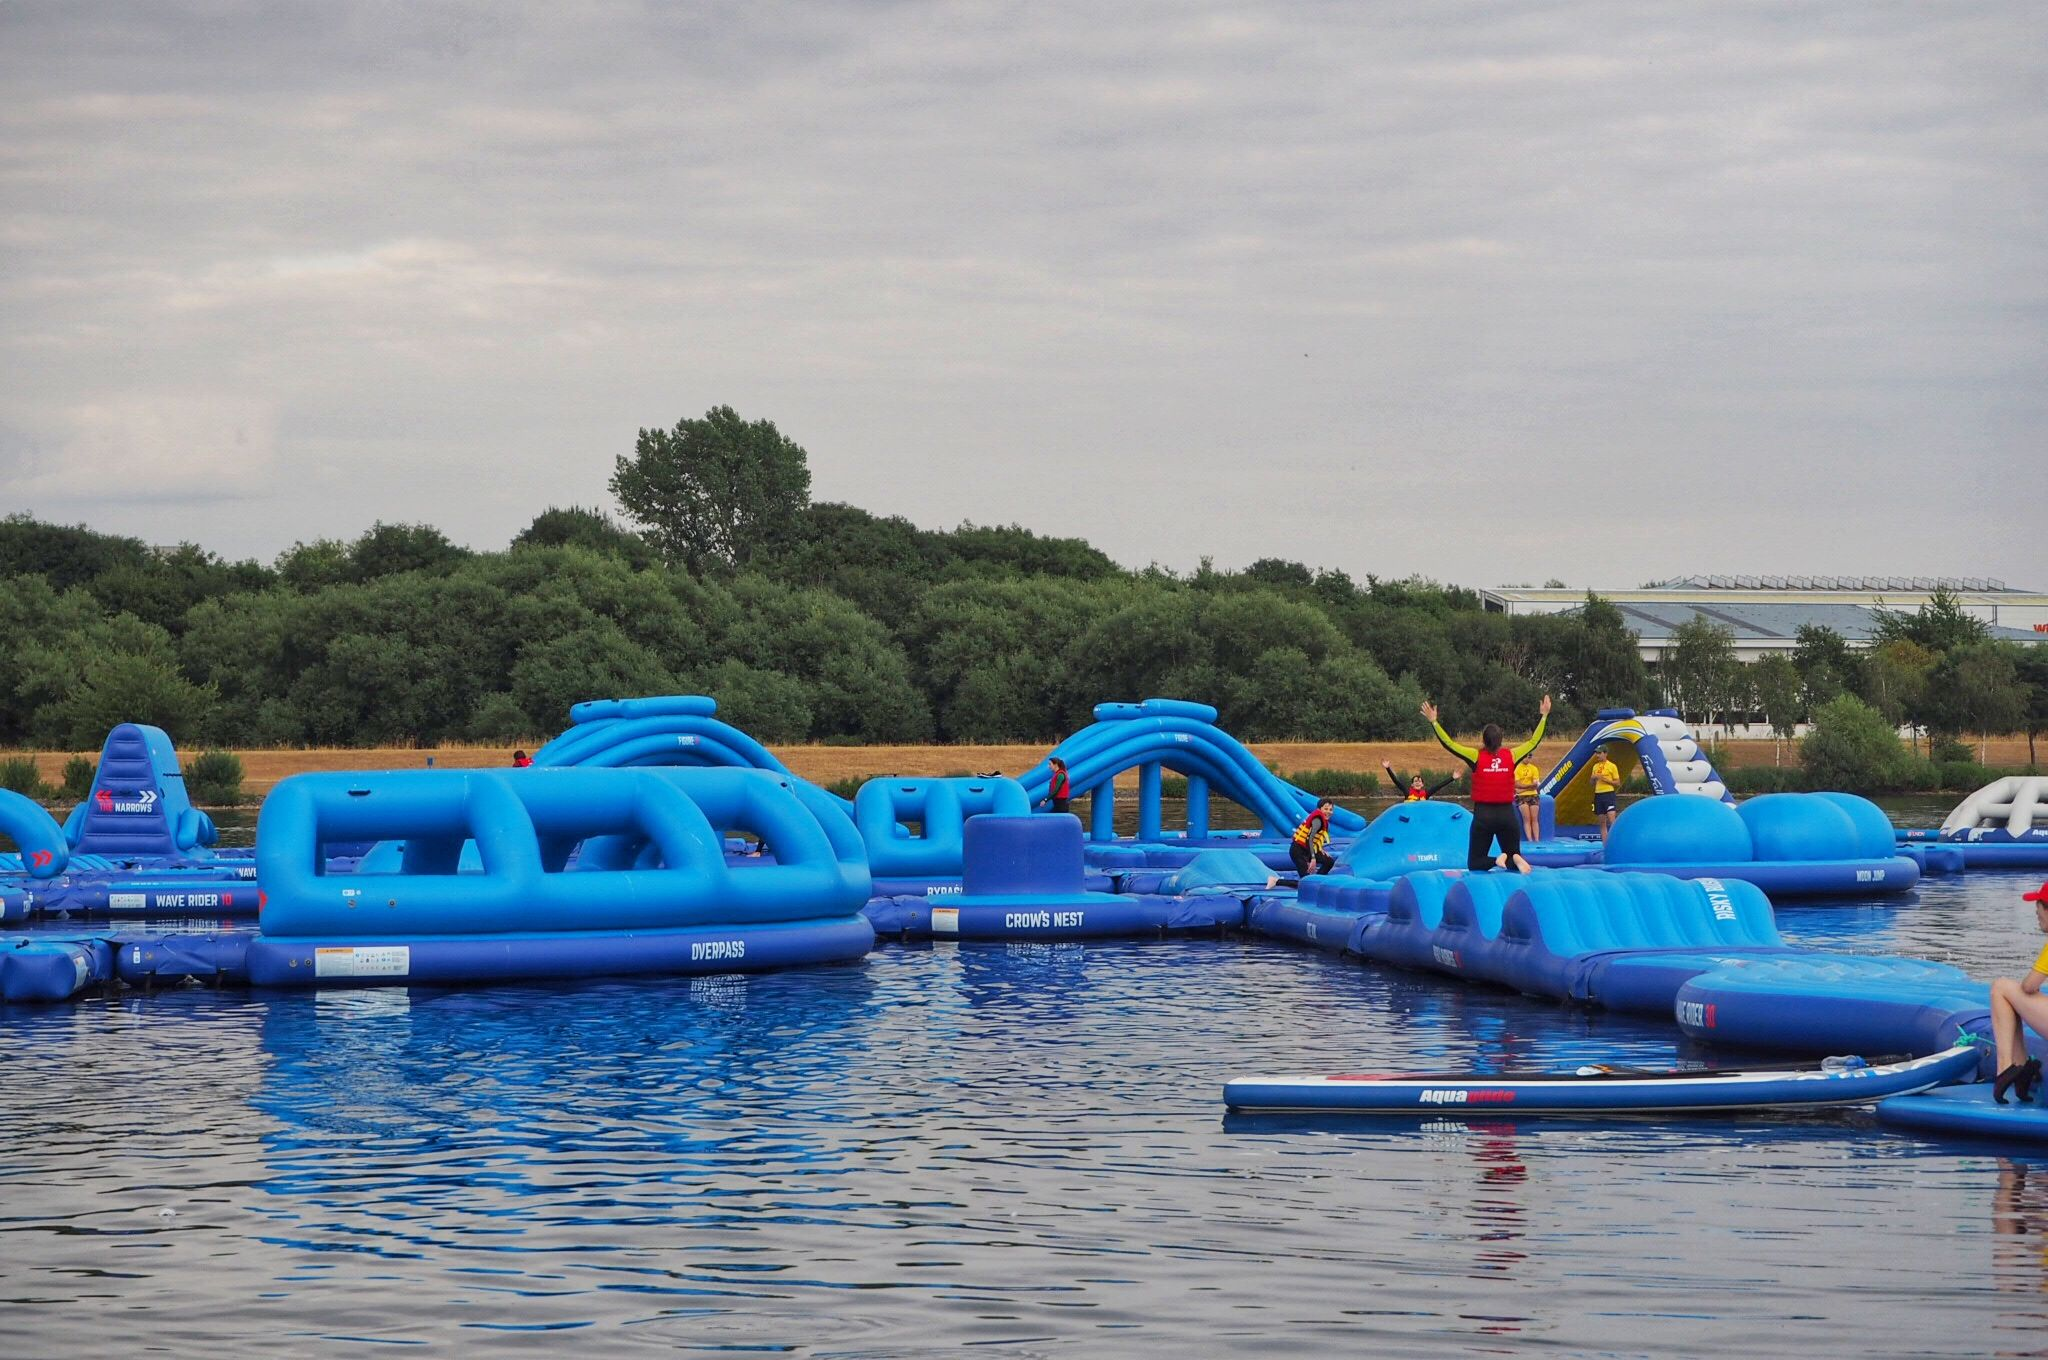 akeside-inflatable-obstacle-course-Aqua-Parcs-Willen-Lake-Milton-Keynes